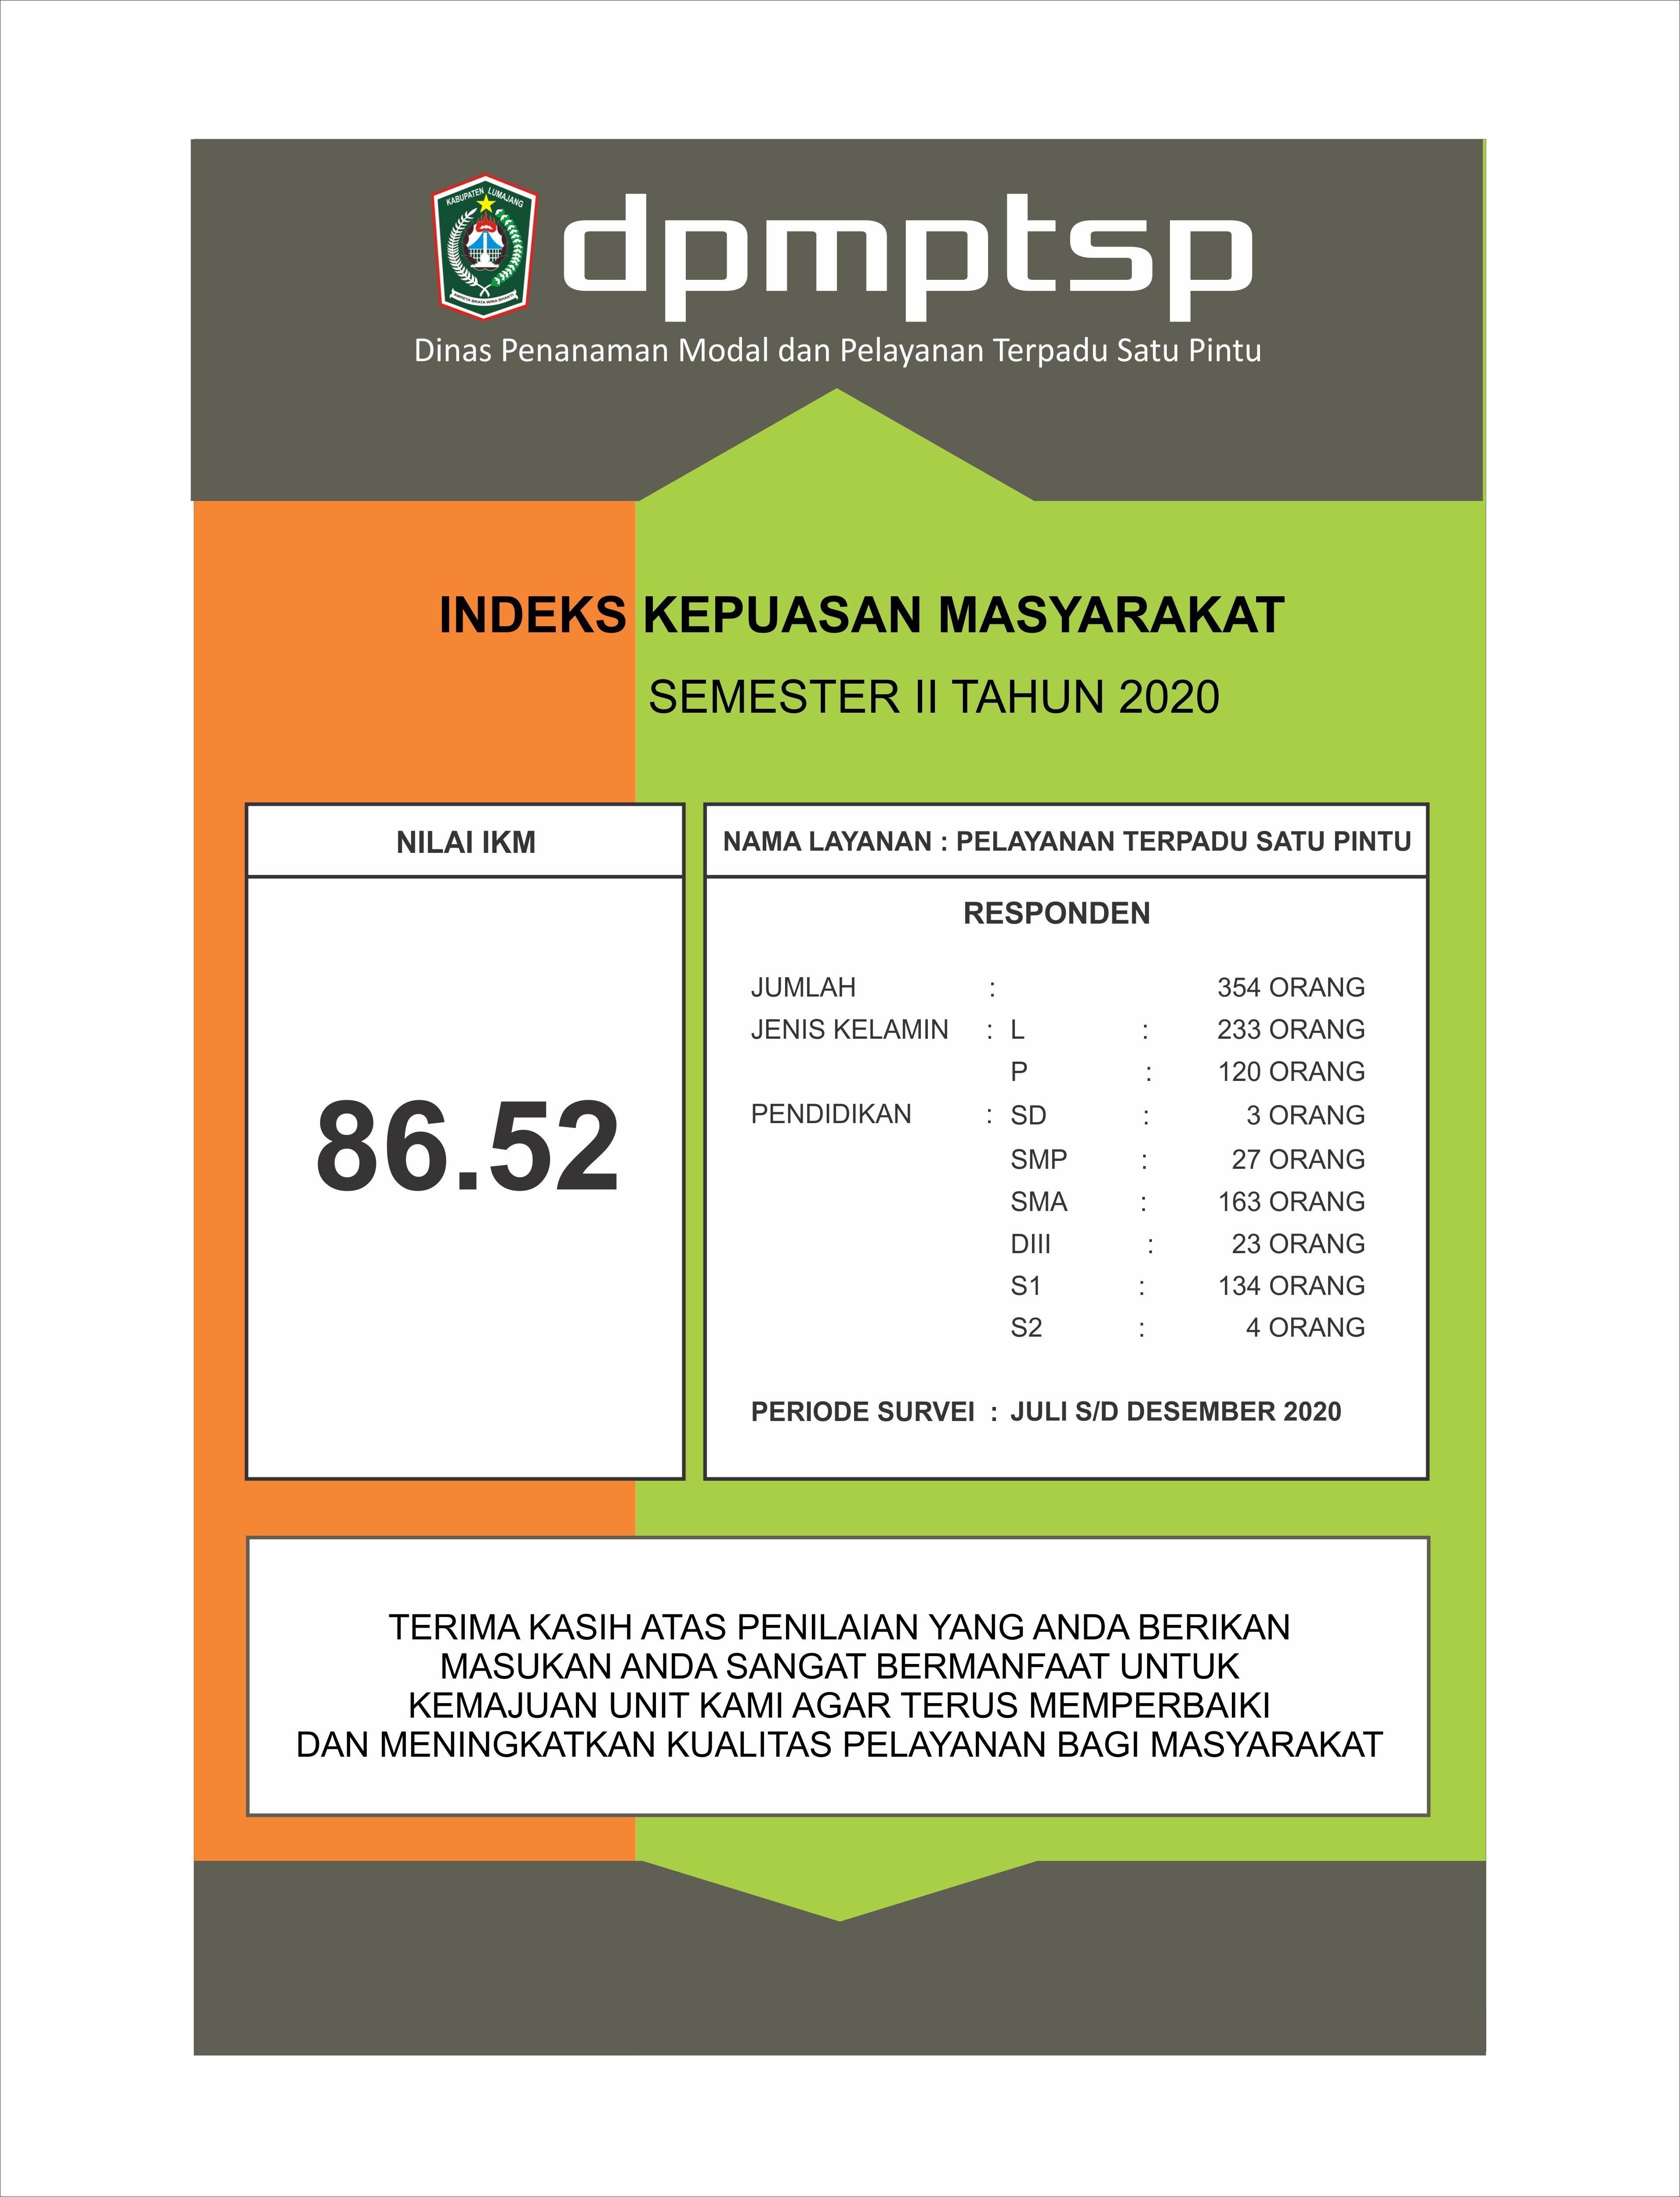 Nilai Indeks Kepuasan Masyarakat Semester II Tahun 2020, DPMPTSP Kabupaten Lumajang